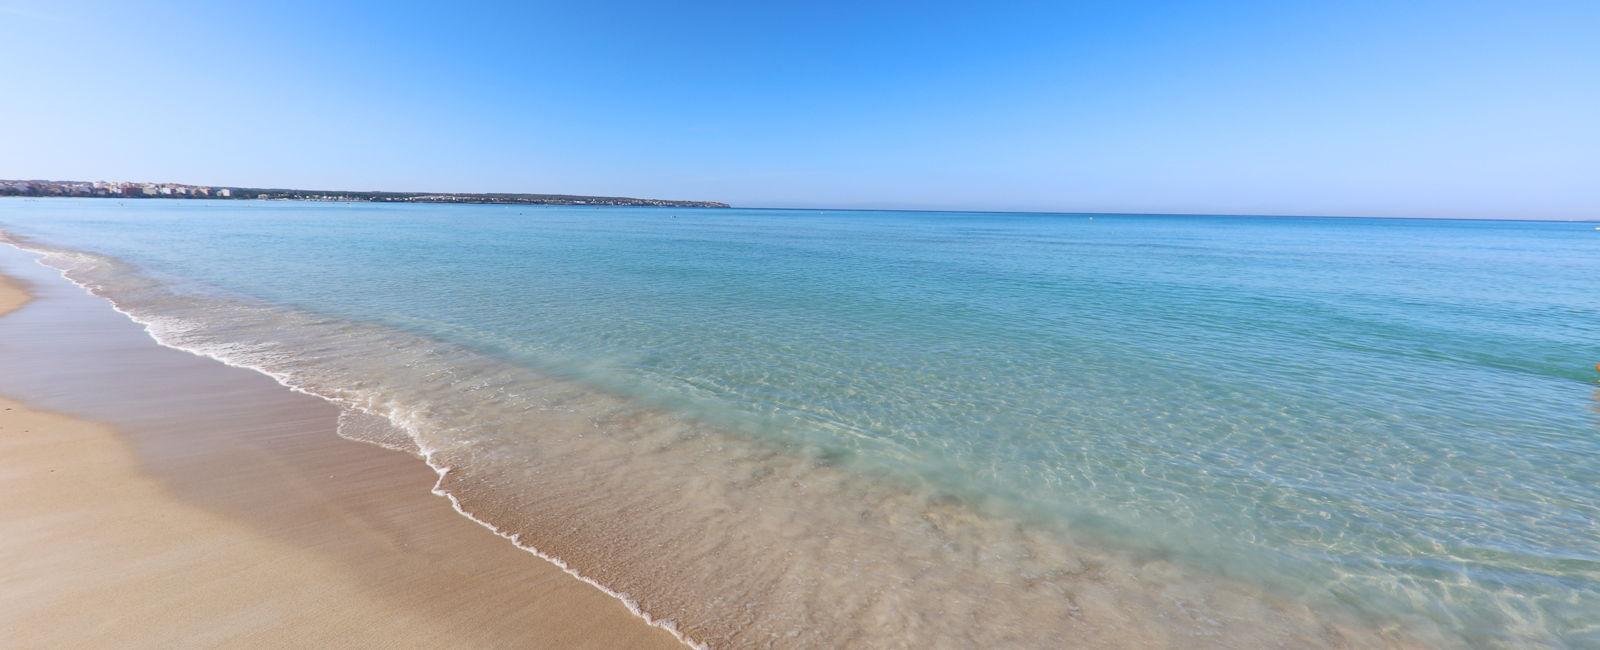 Luxury Playa de Palma Holidays